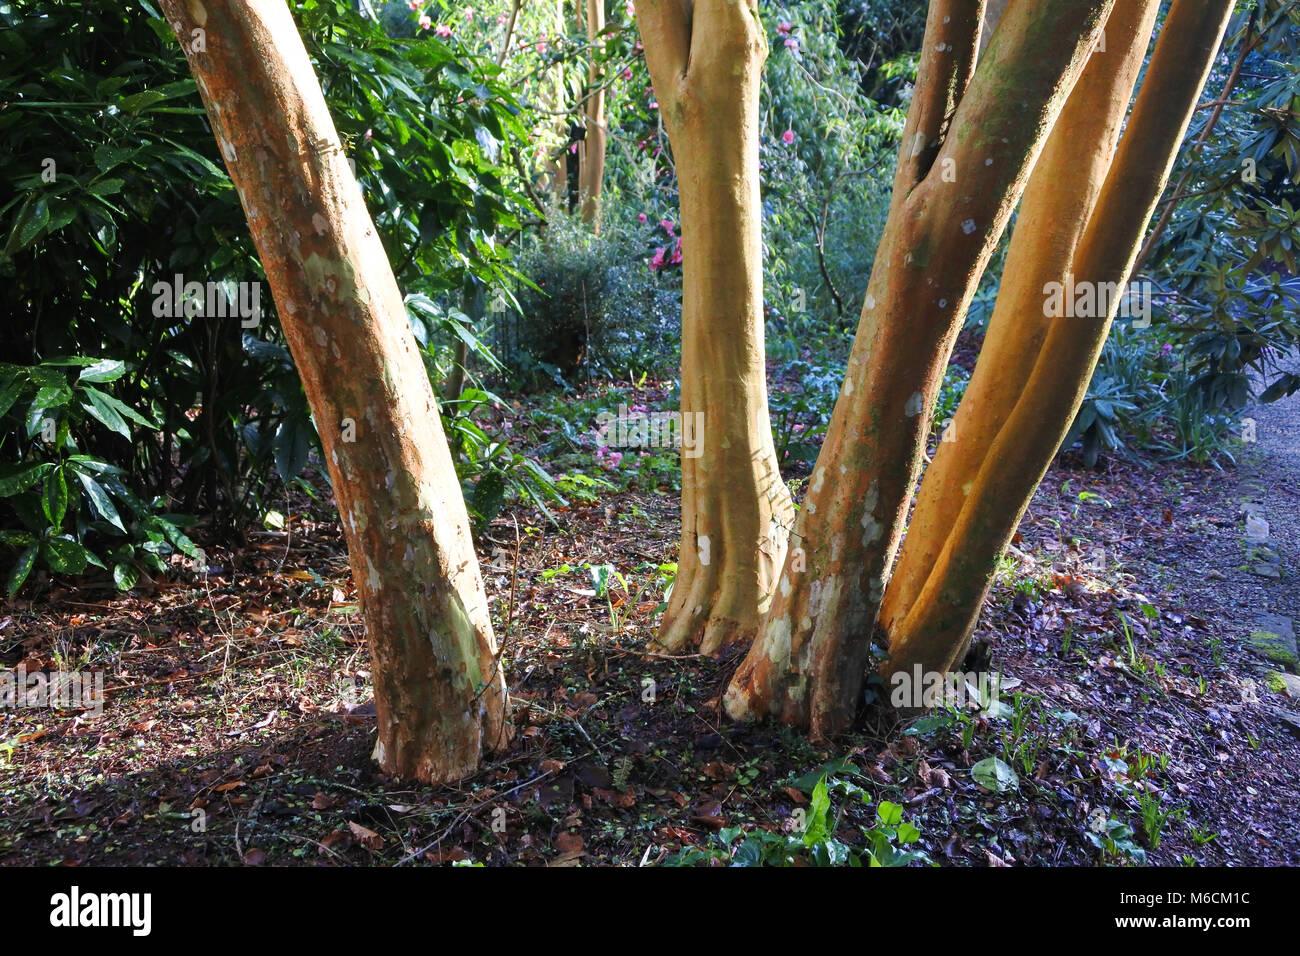 The stems of Myrtus Luma bathed in winter sunlight - John Gollop - Stock Image